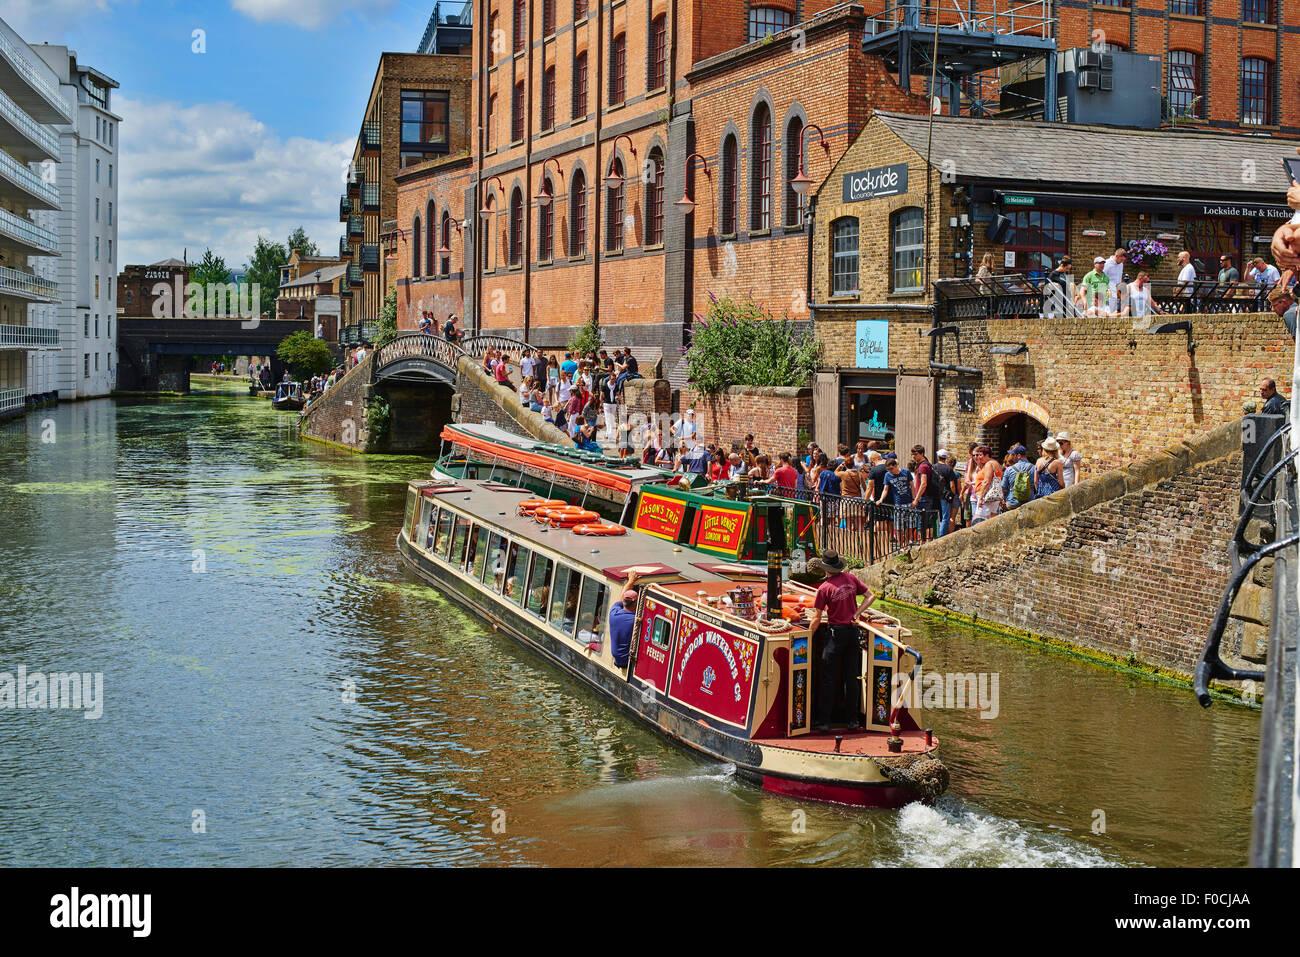 El mercado de Camden, Londres, Ingland, Reino Unido, Europa Imagen De Stock